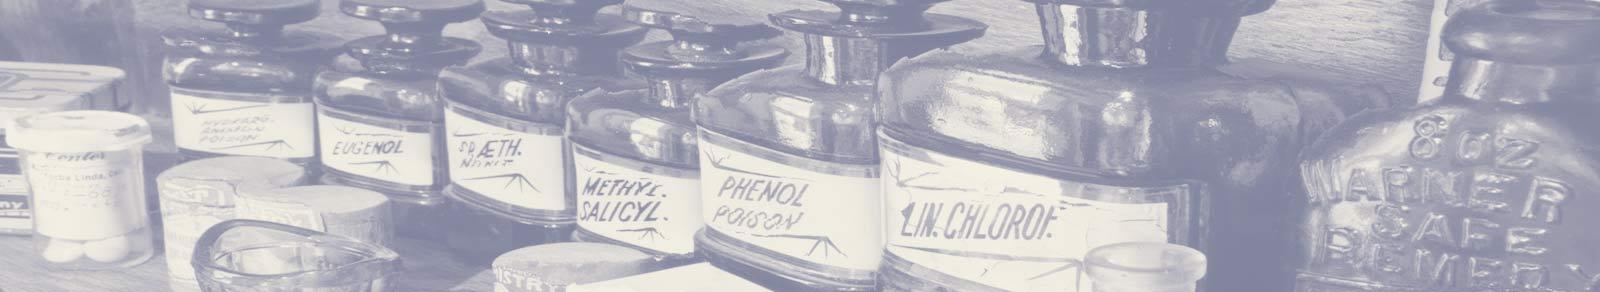 herb-medicine-3